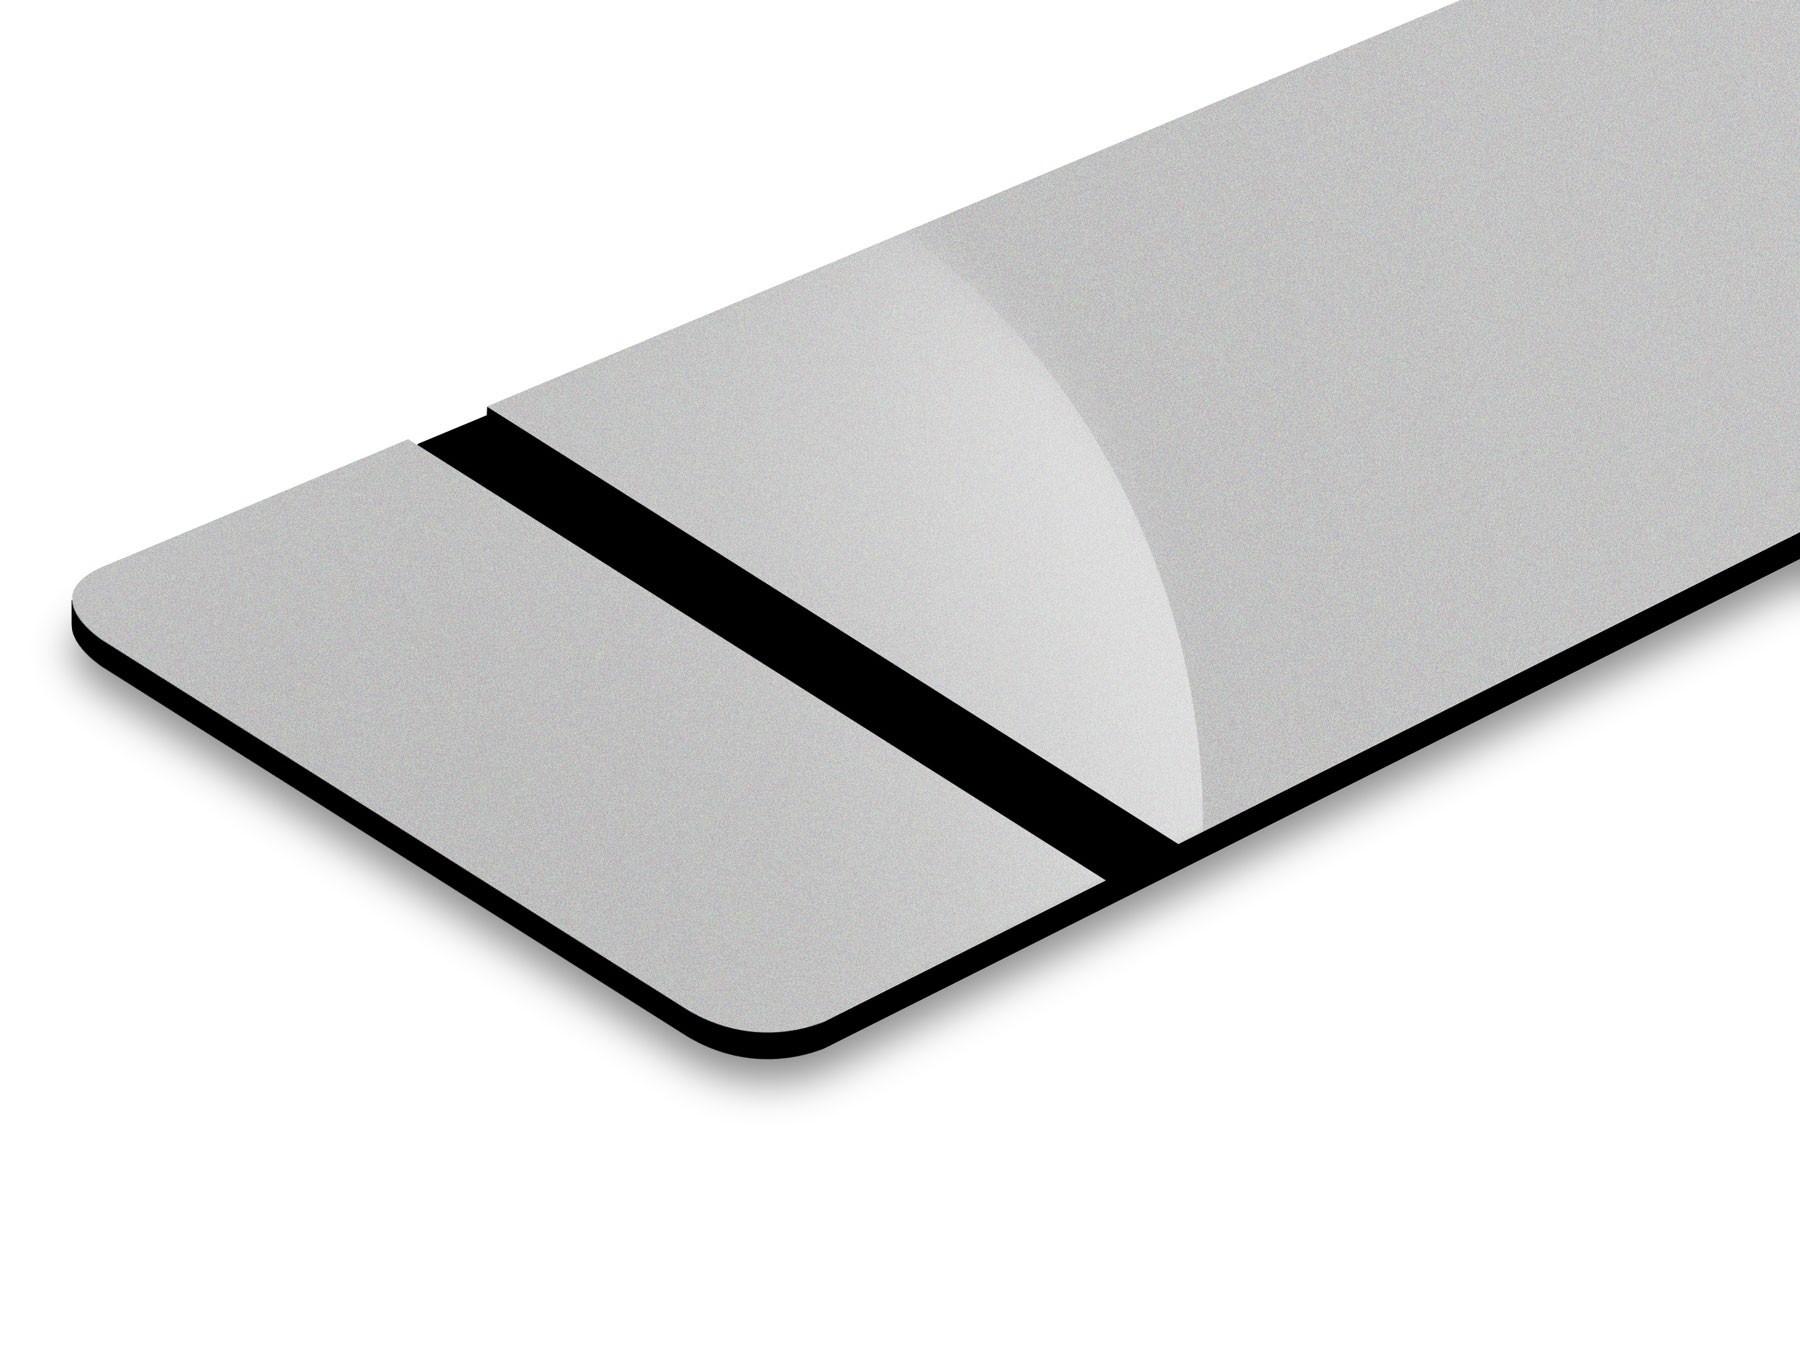 TroLase Thins, Trophy Silver/Black, 2ply, 0.5 mm